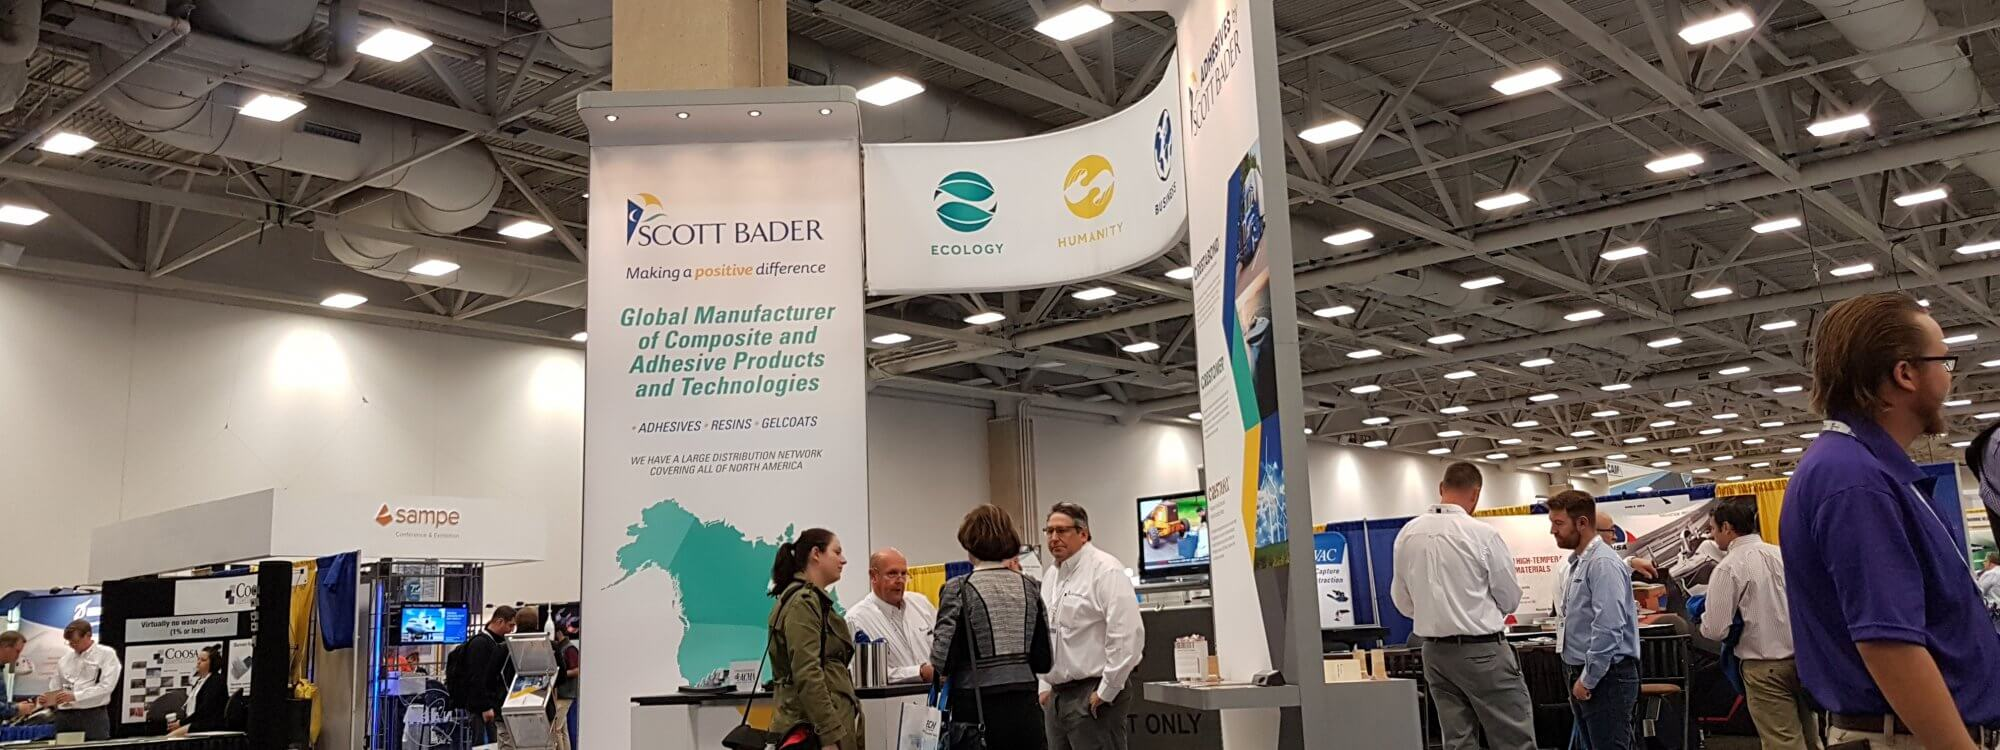 Scott Bader North America exhibiting at CAMX 2019